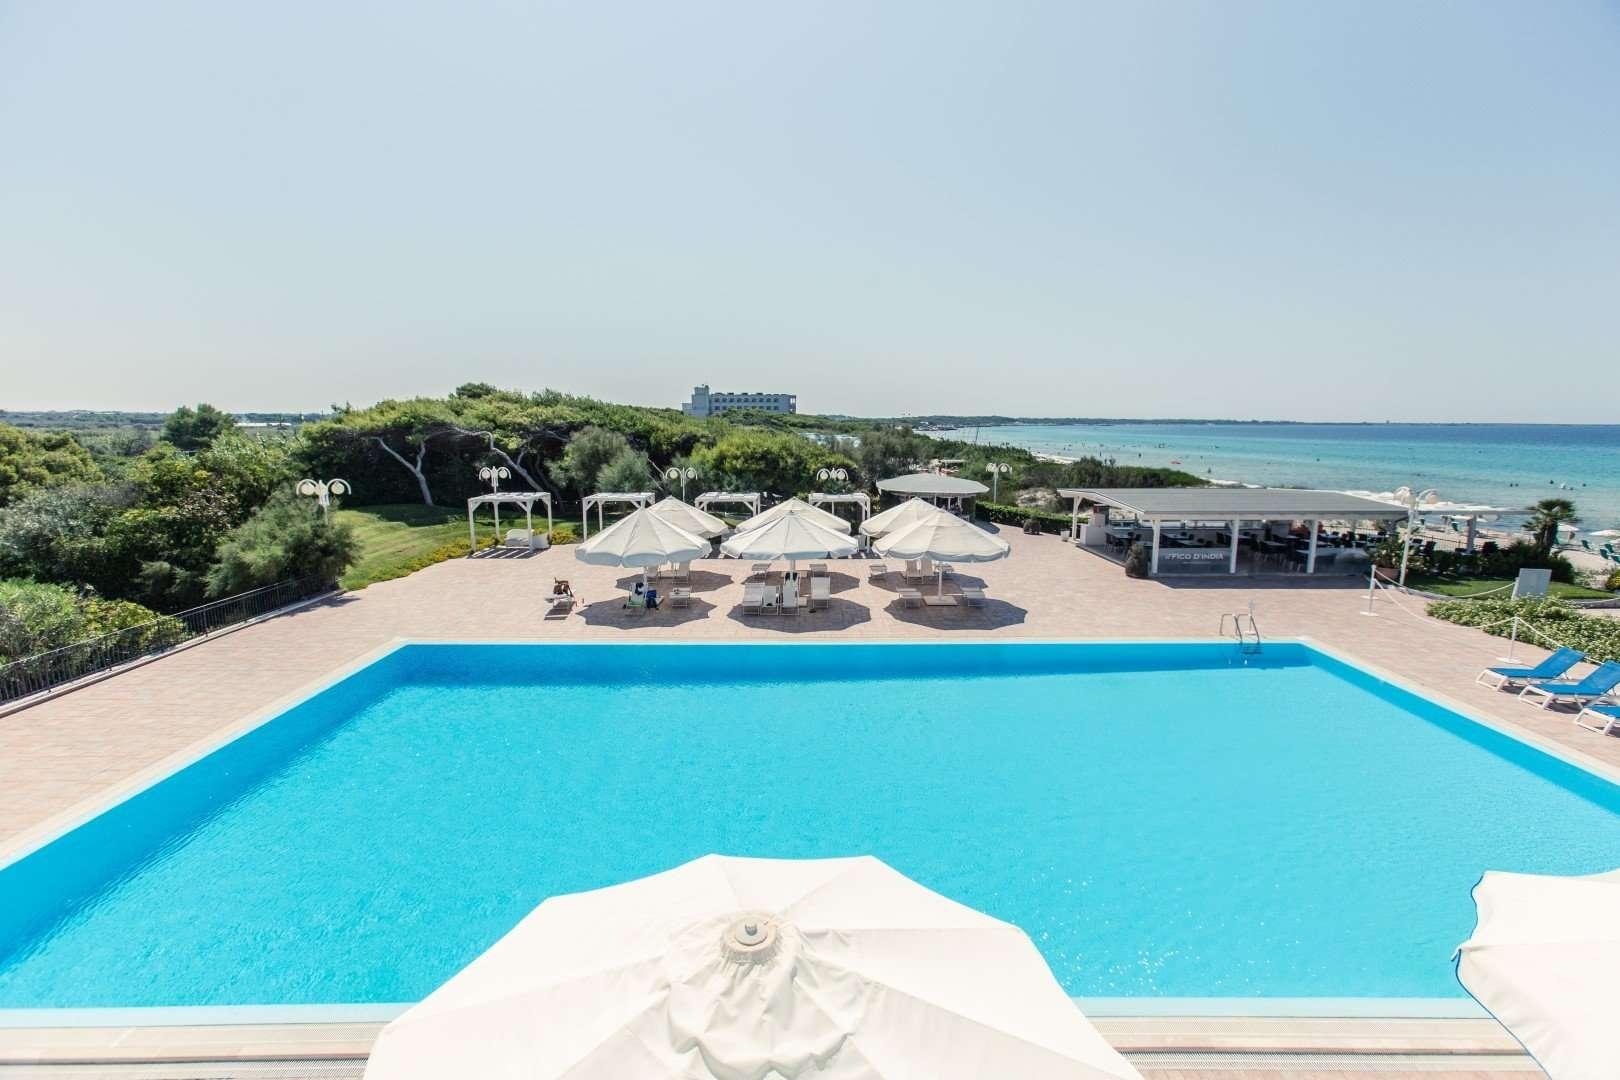 hotel costa brada - gallipoli - puglia - italie -zwembad